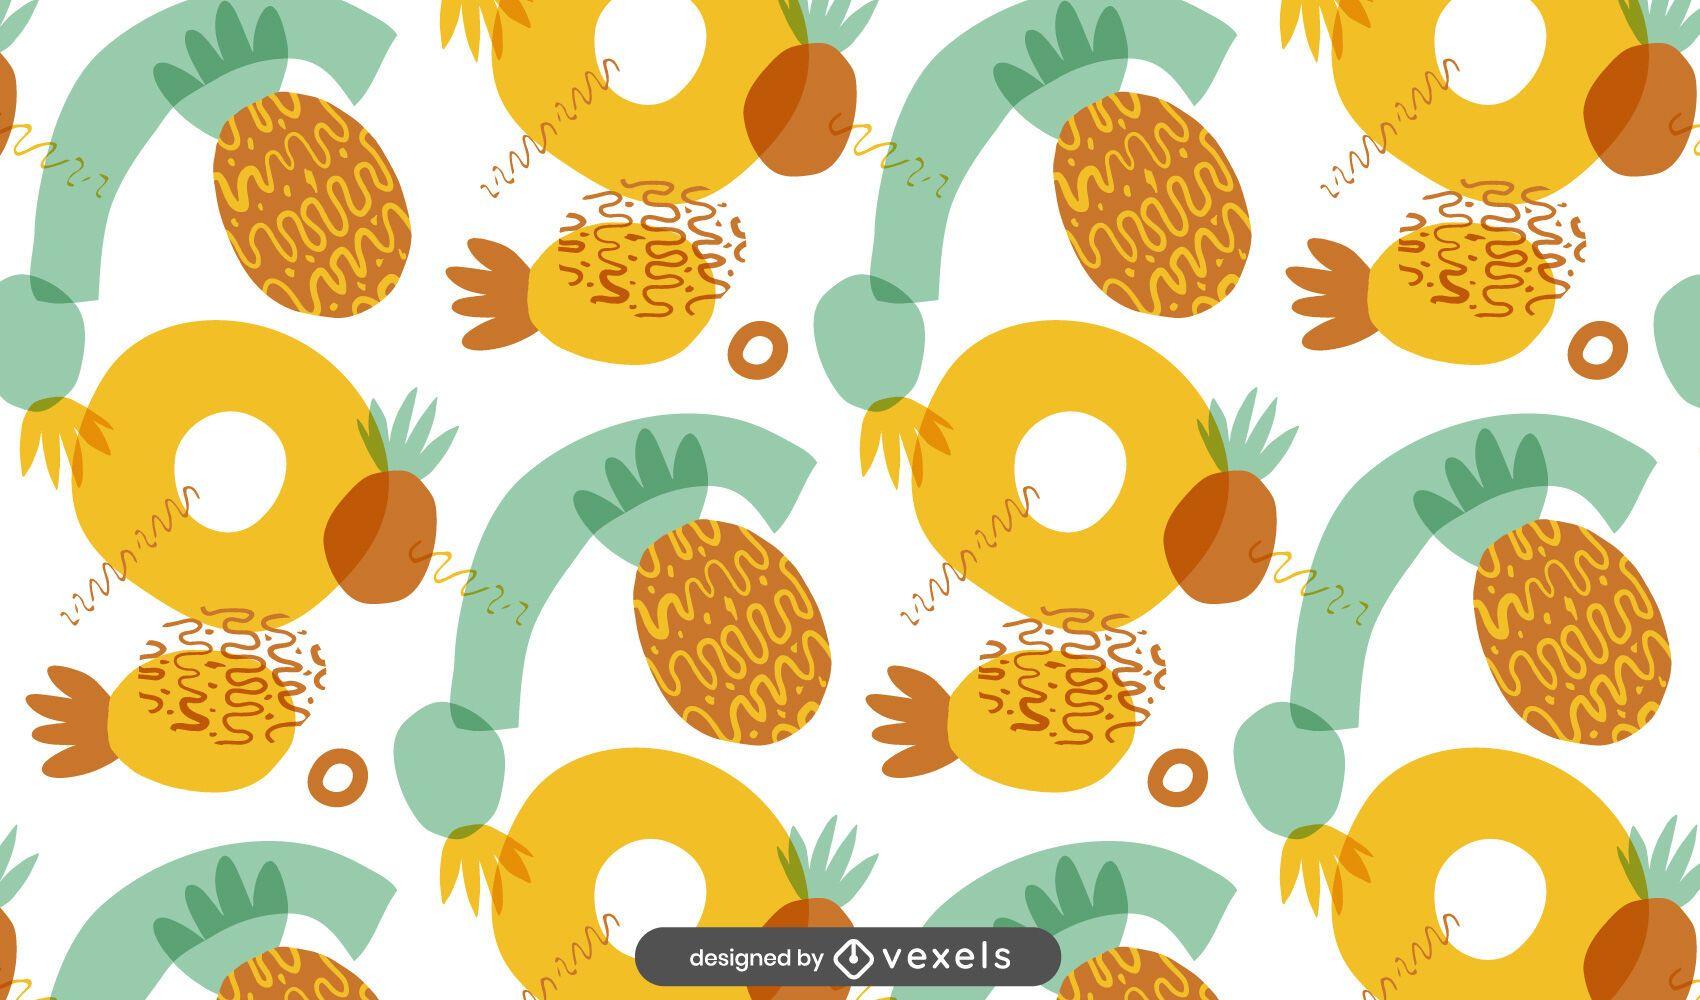 Abstraktes Musterdesign der Ananas